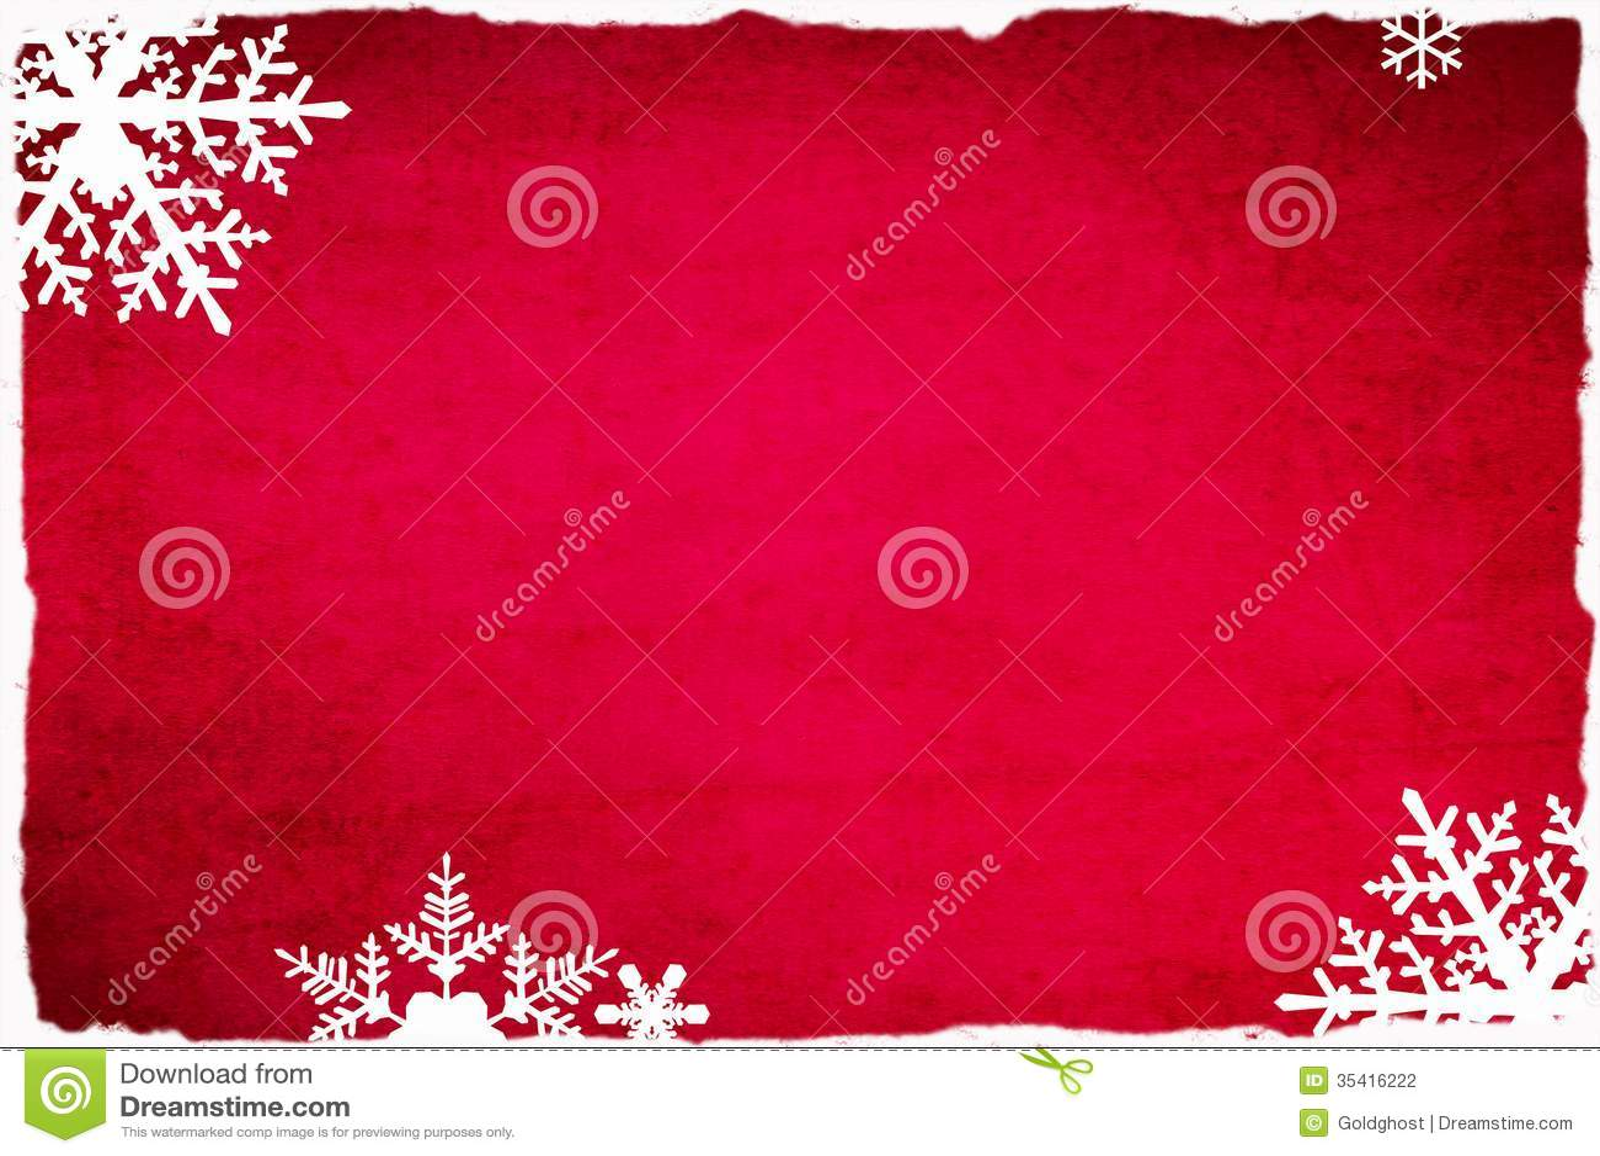 Christmas Winter Background Stock Photography - Image: 35416222